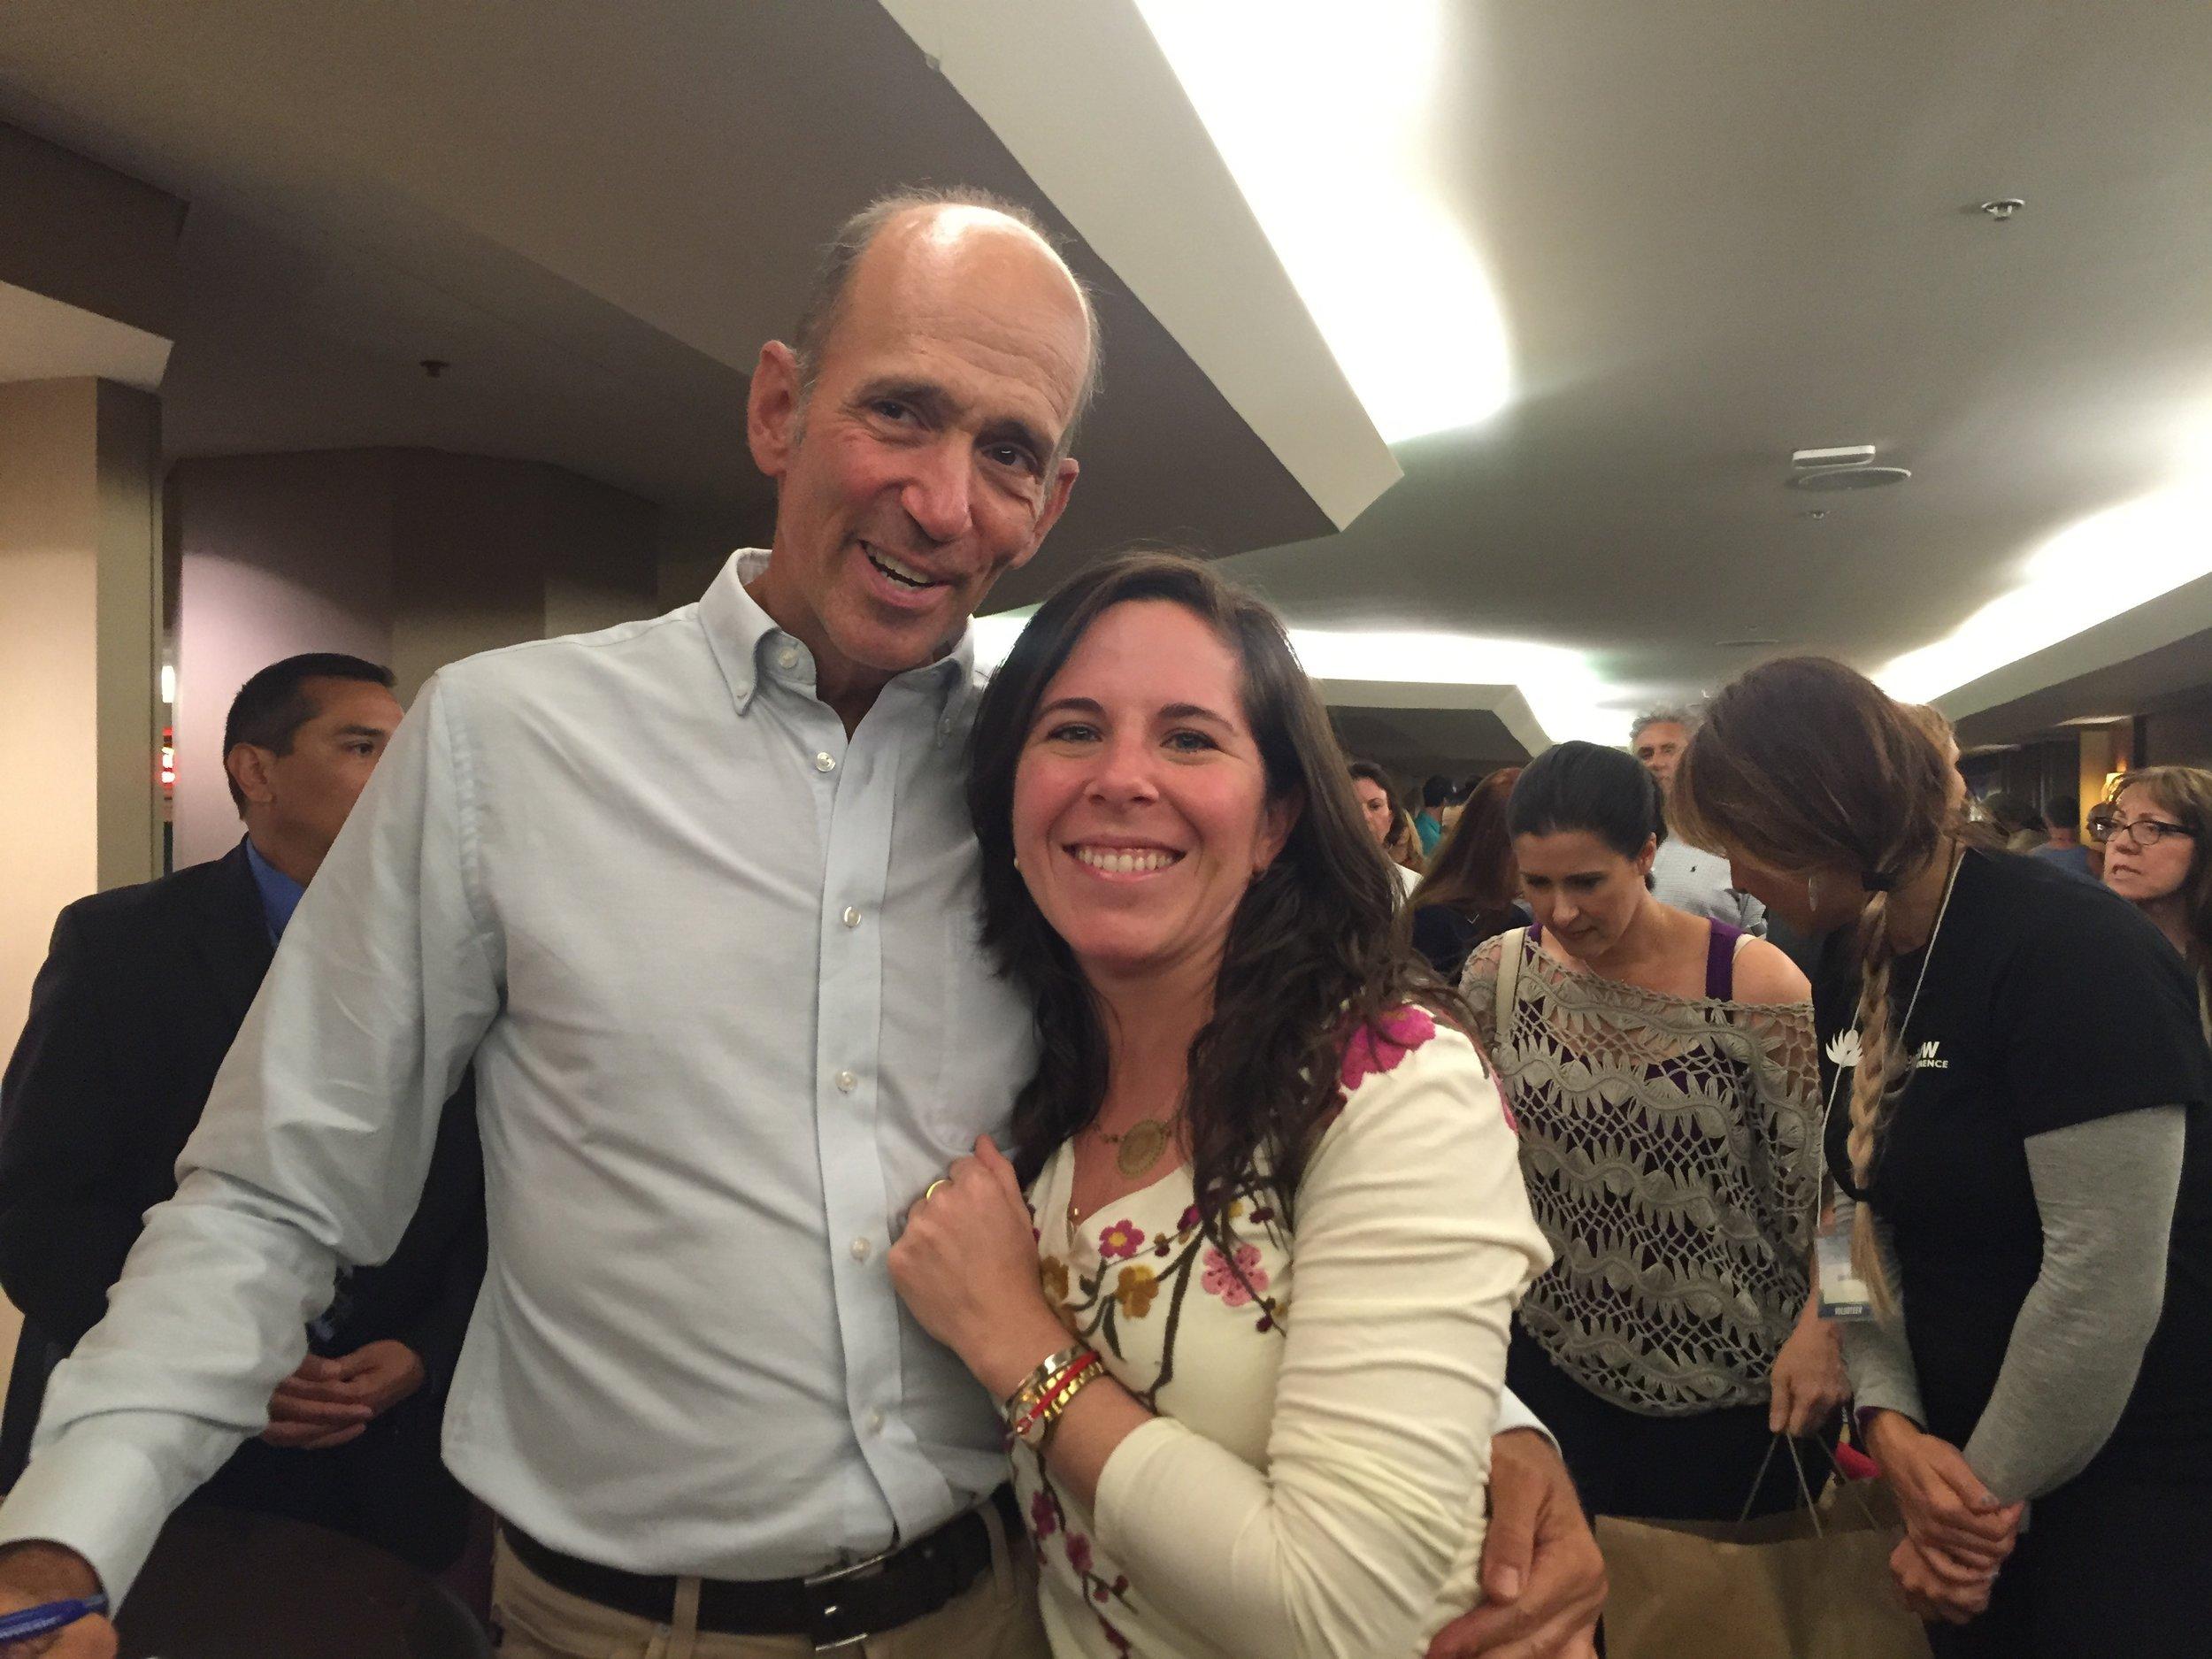 Meeting one of my heroes, Dr. Mercola!